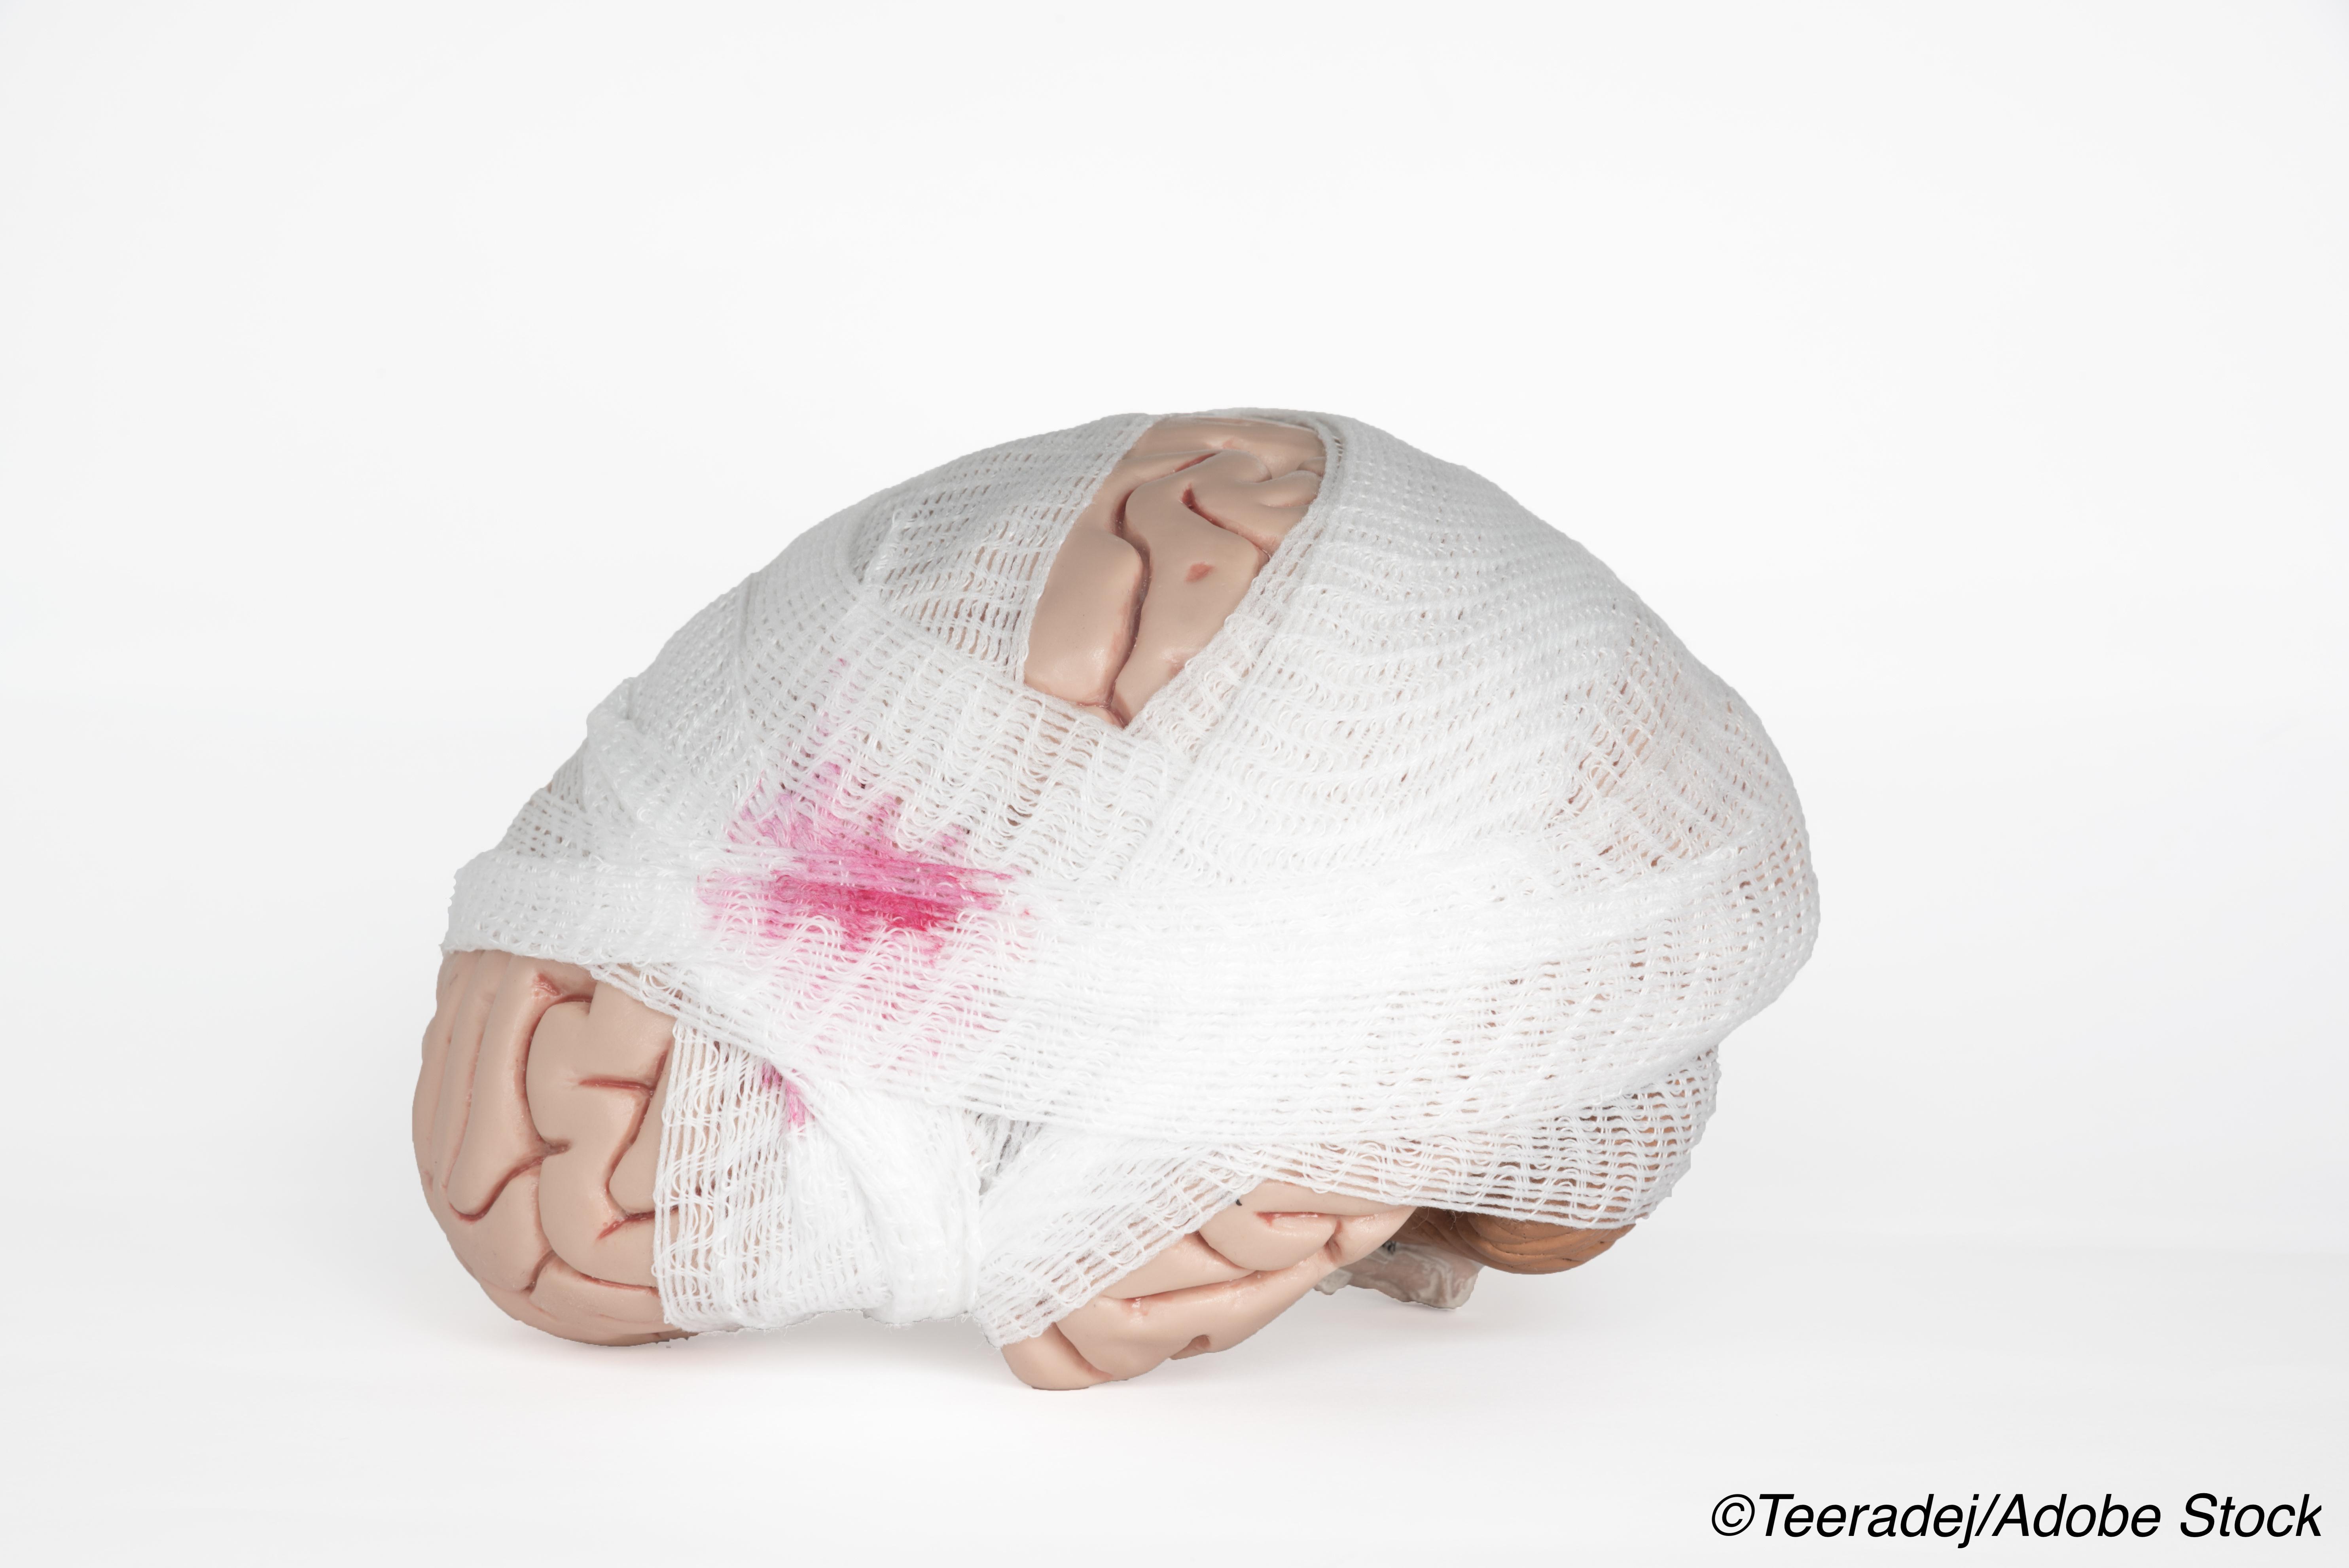 TBI Outcomes No Different With Pre-Hospital Tranexamic Acid